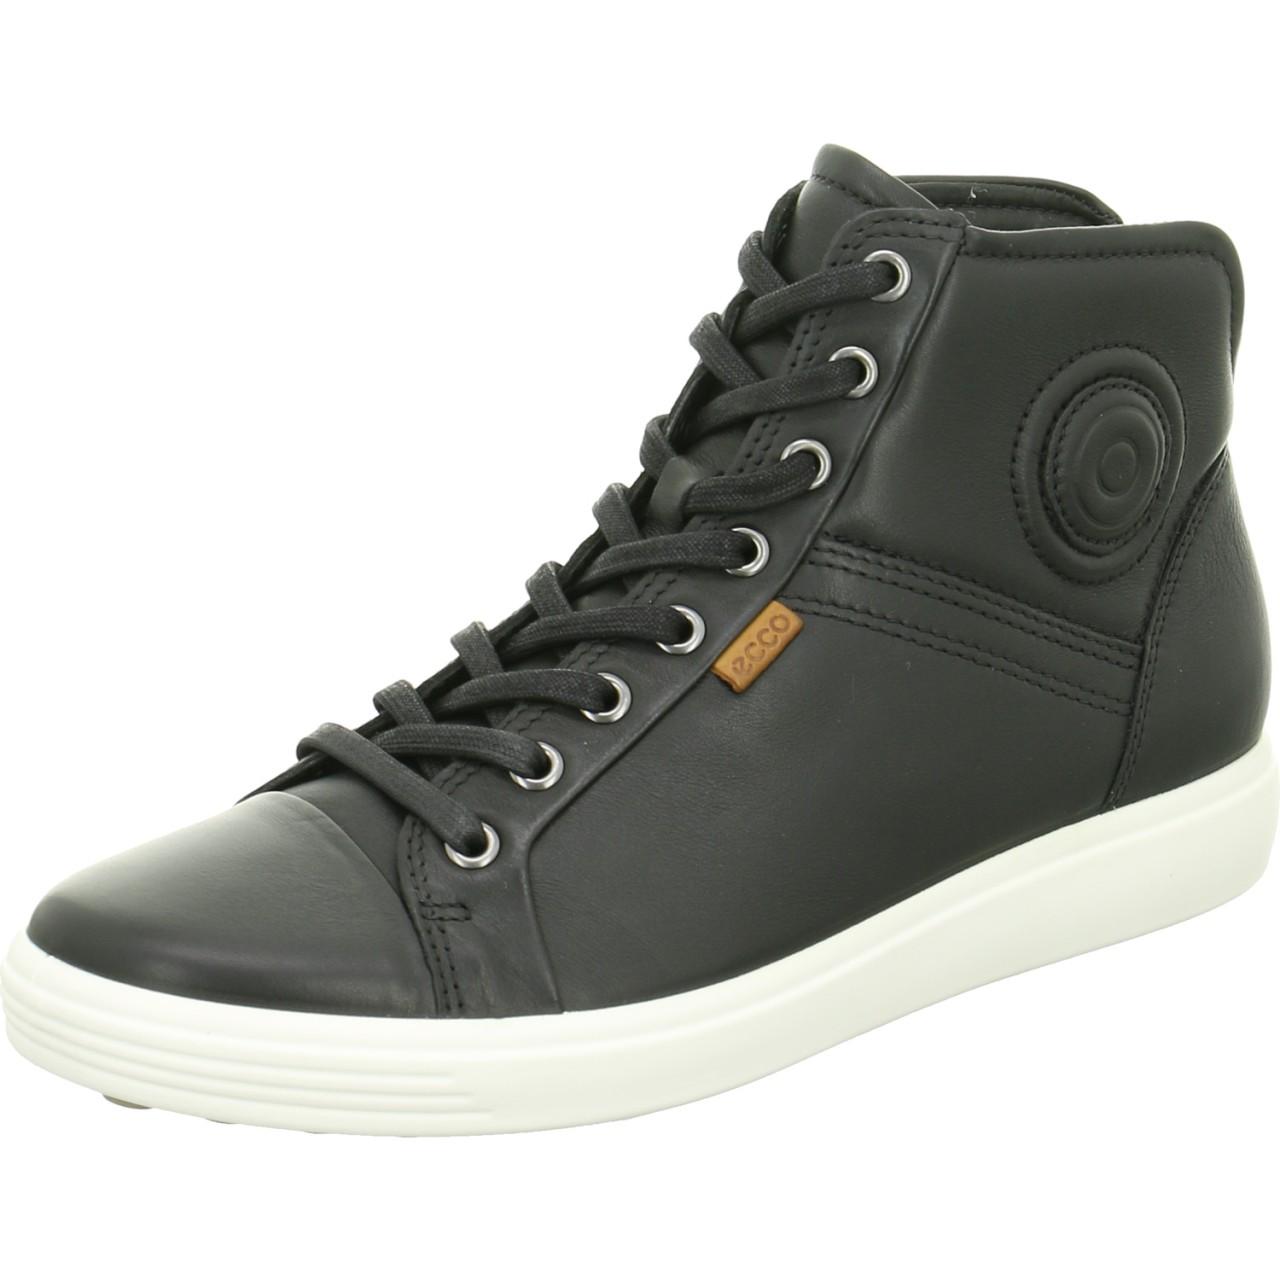 Ecco Sneaker schwarz Soft 7 Ladies schwarz